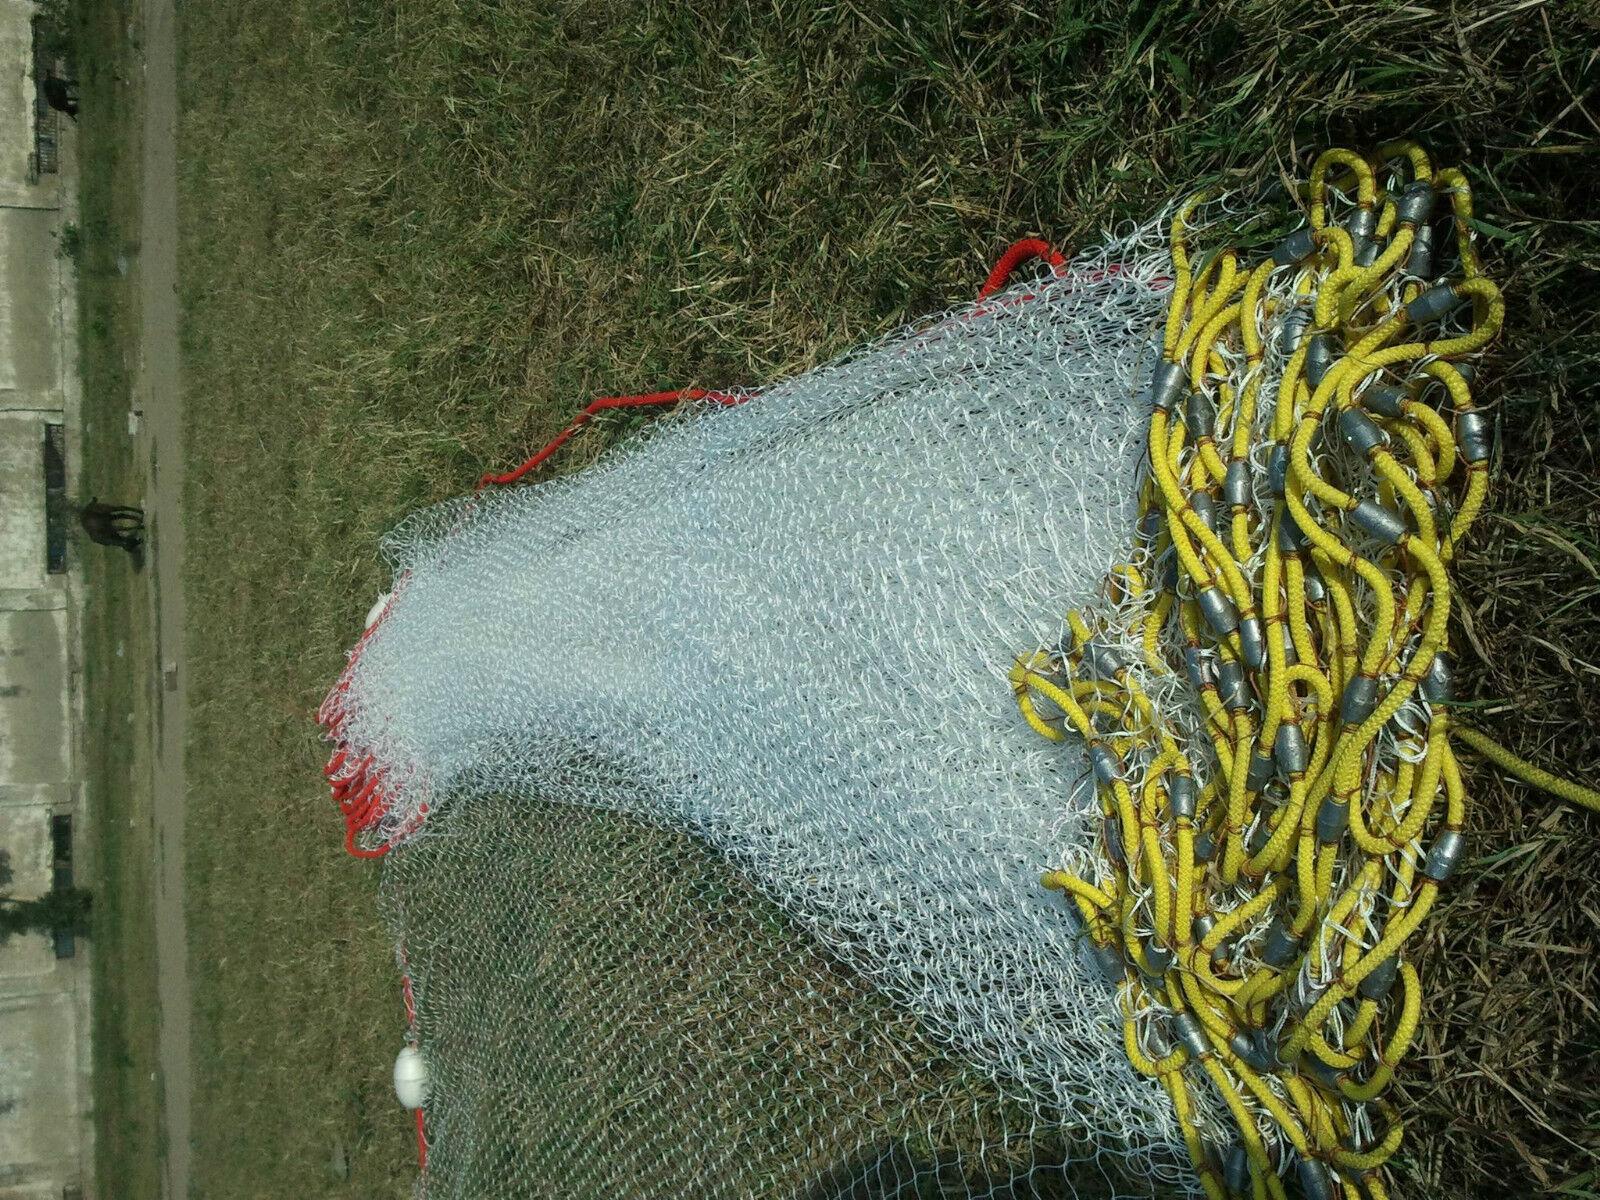 Sandeel Minnow seine net 50' to120' fishing bait 5 8 inch Mesh optional Cod End